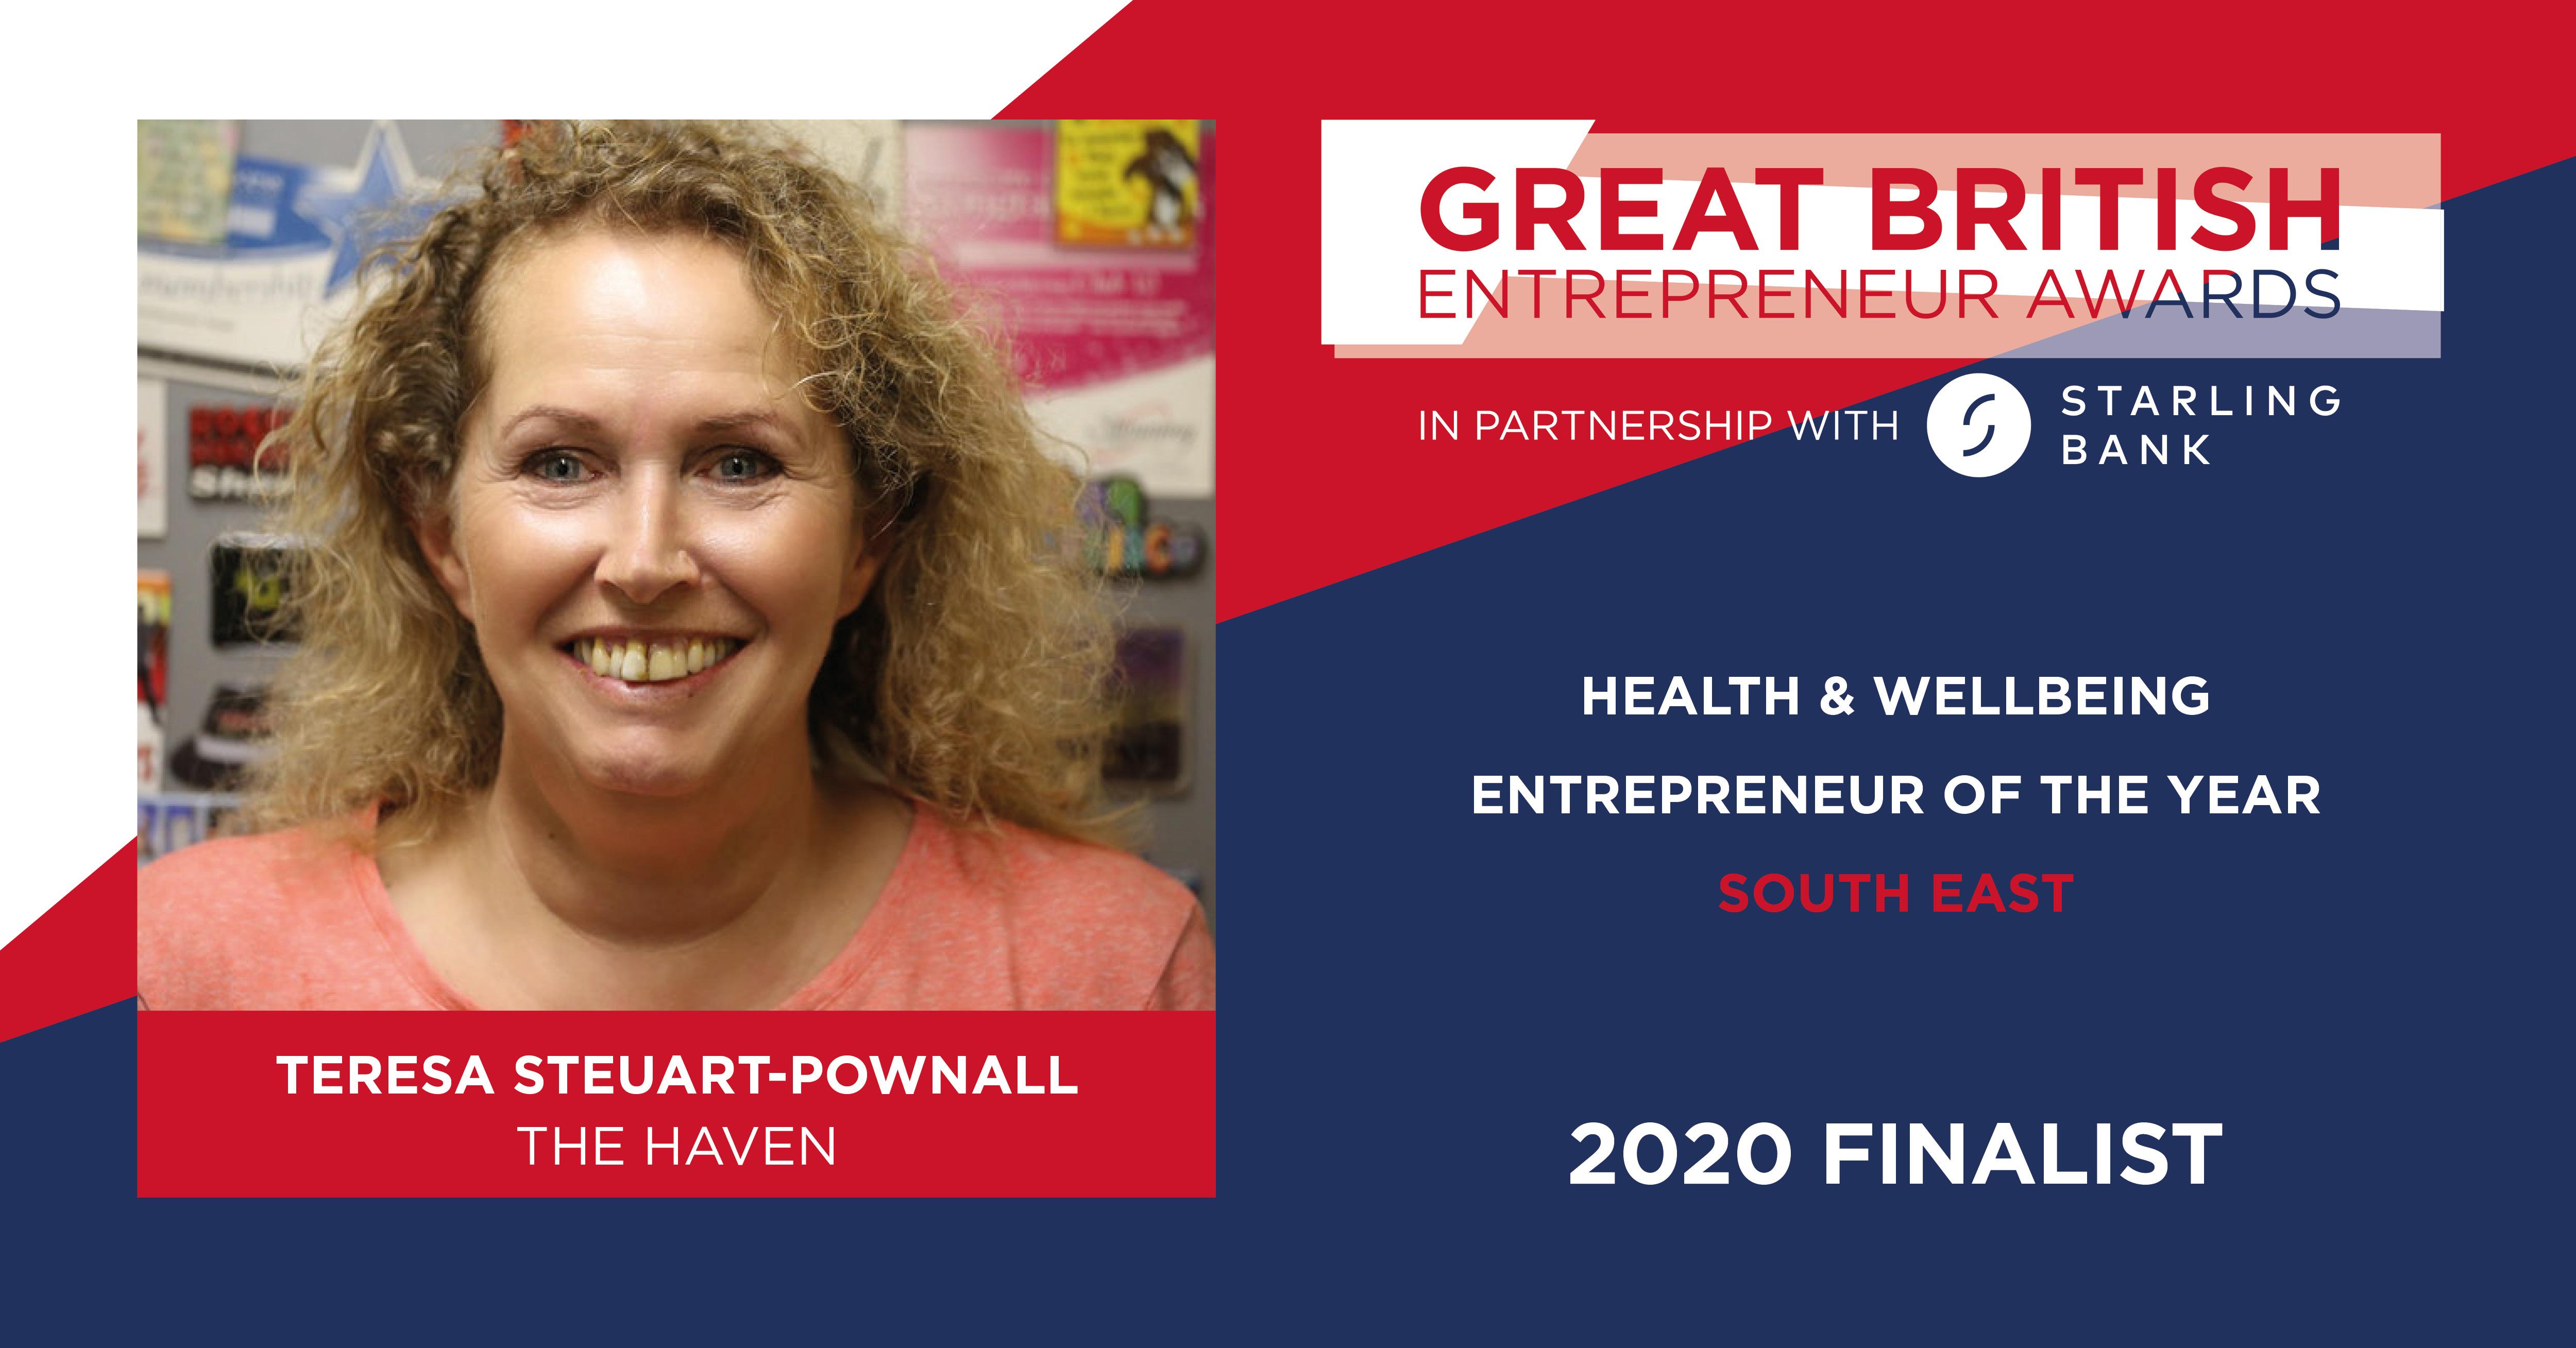 Teresa Steuart-Pownall - Finalist, Great British Entrepreneur Awards